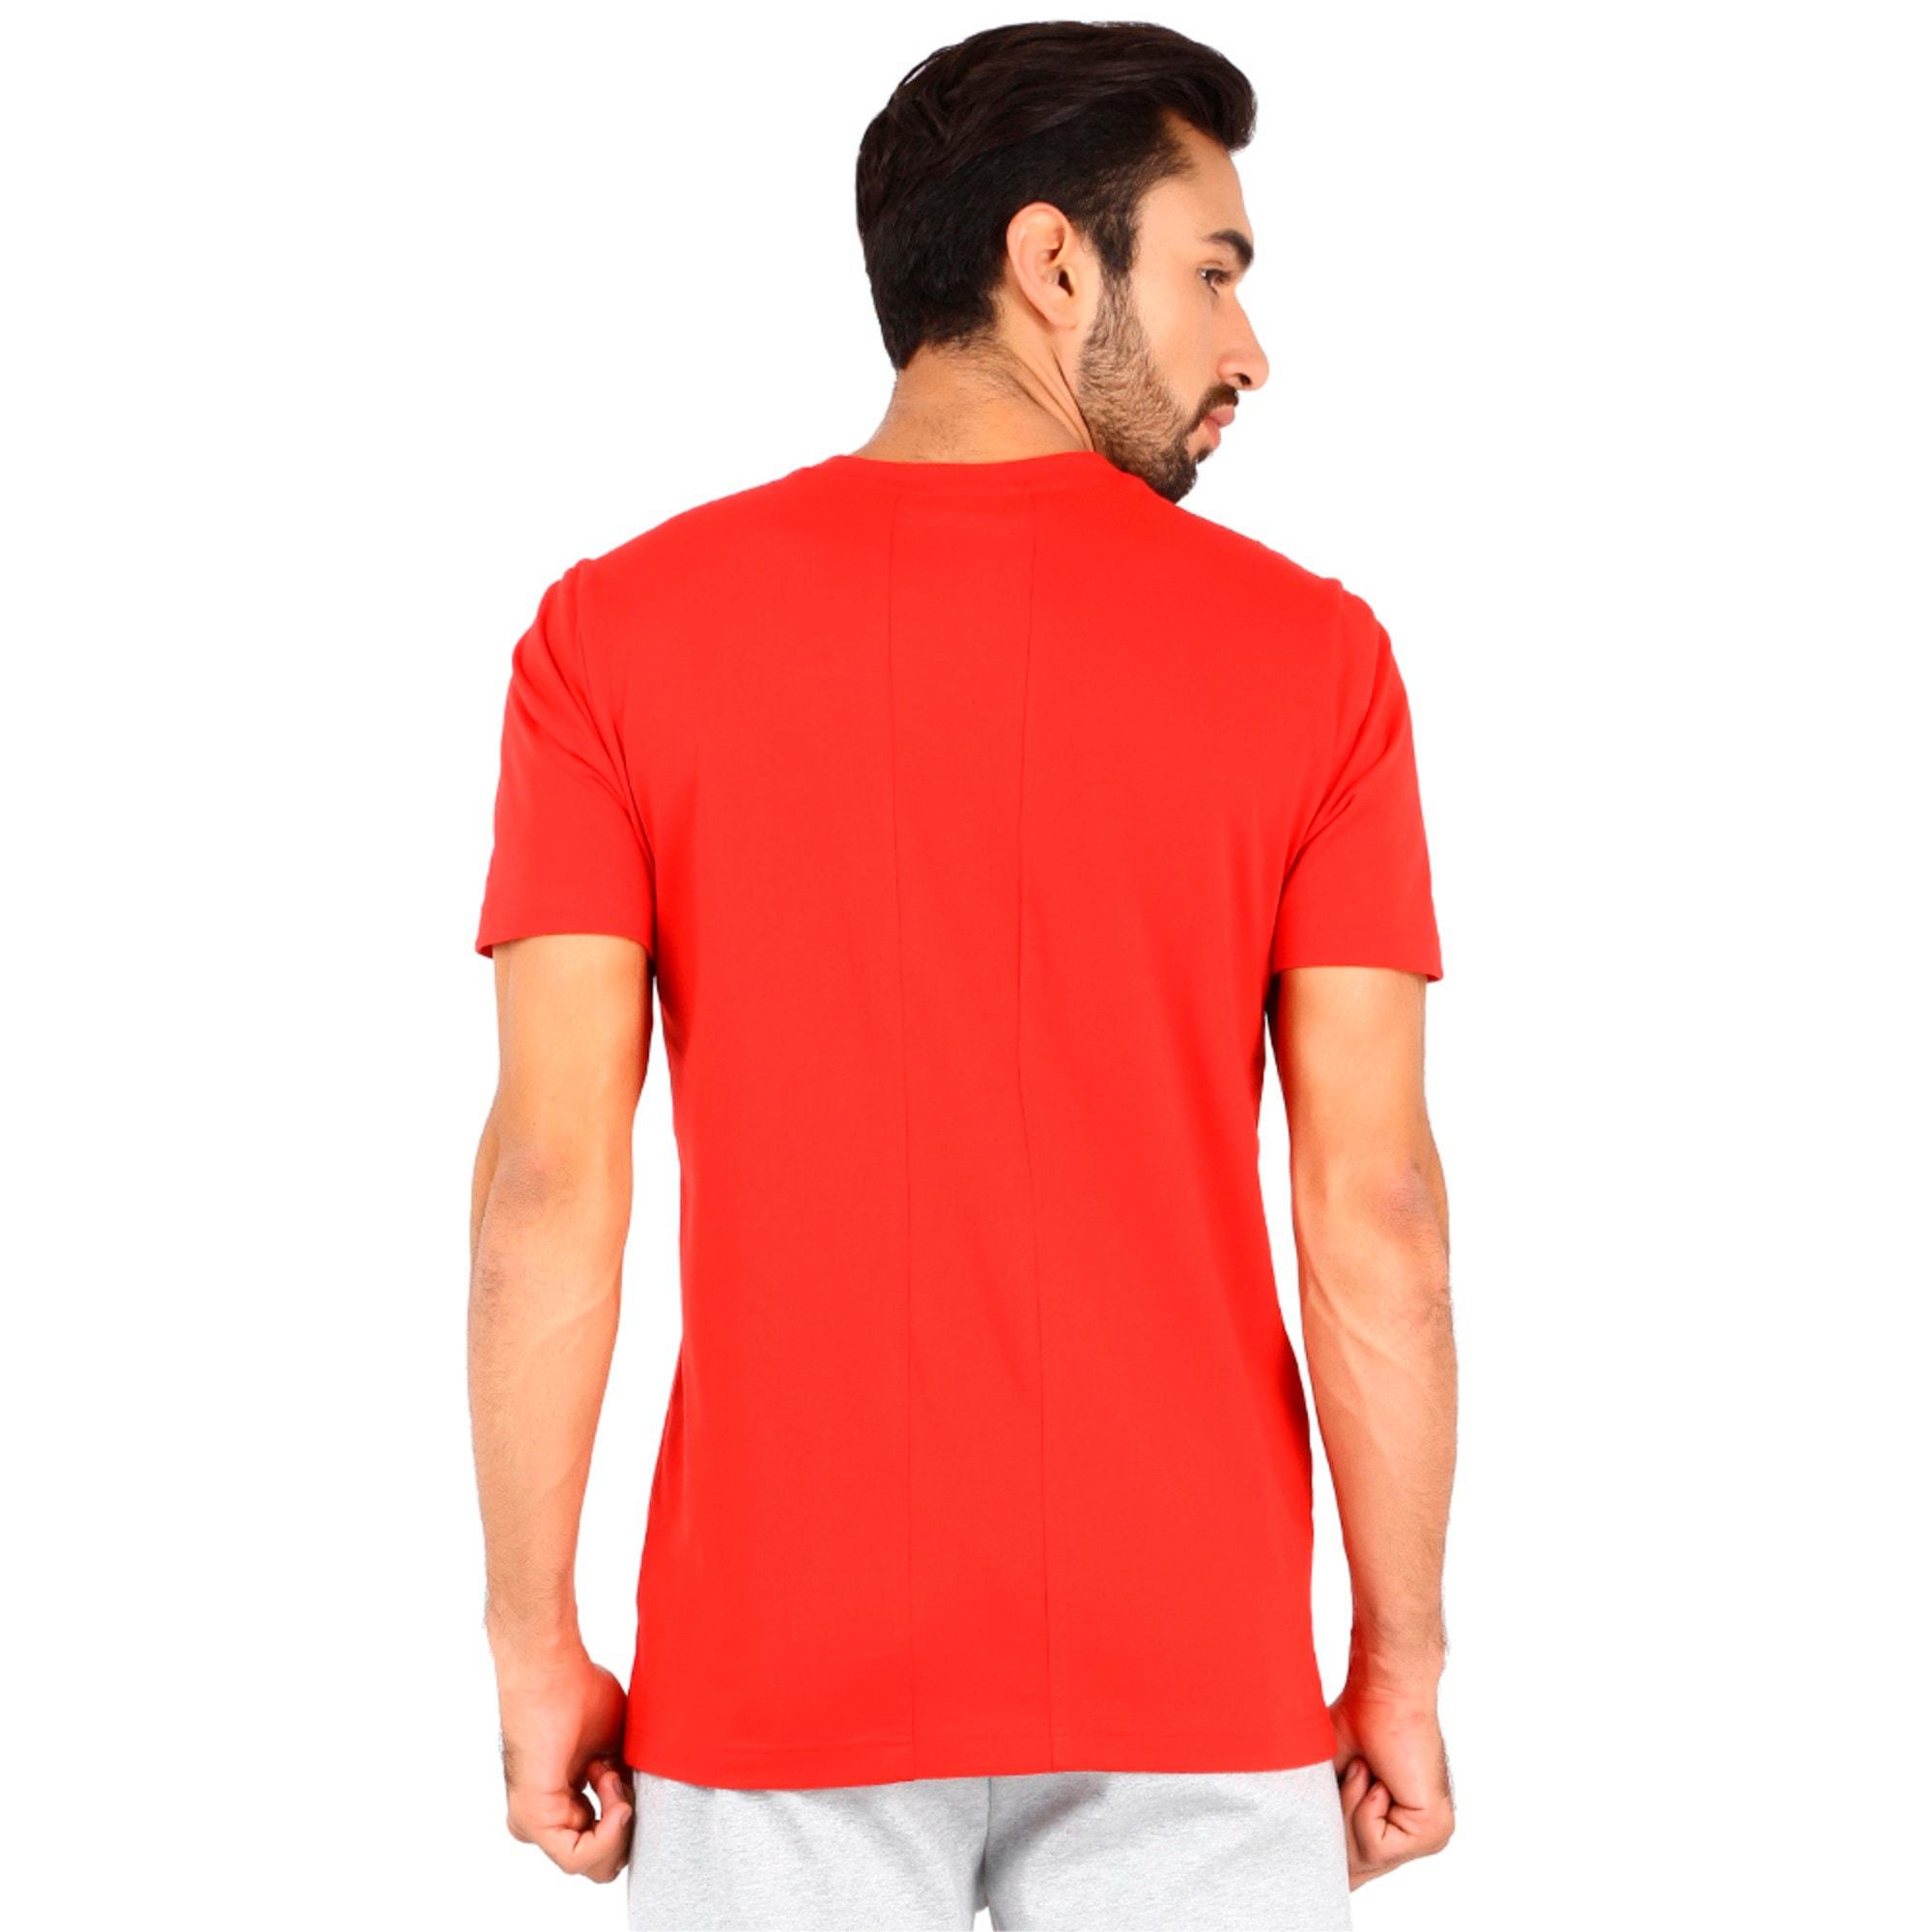 Thumbnail 2 of Ferrari Graphic T-Shirt, rosso corsa, medium-IND